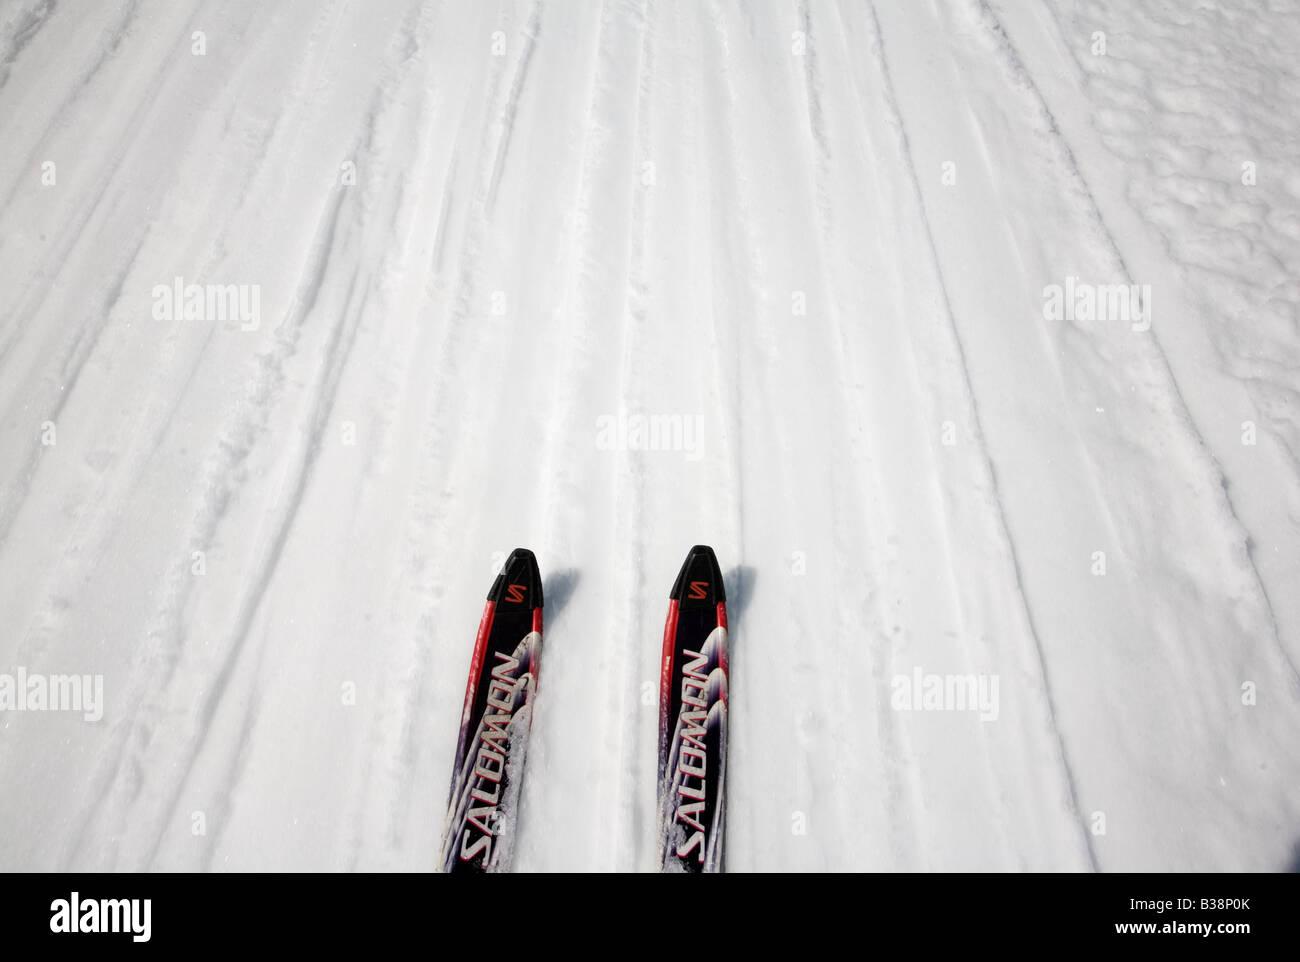 Norway Jotunheimen fjell Galdhöpiggen summer skiing - Stock Image